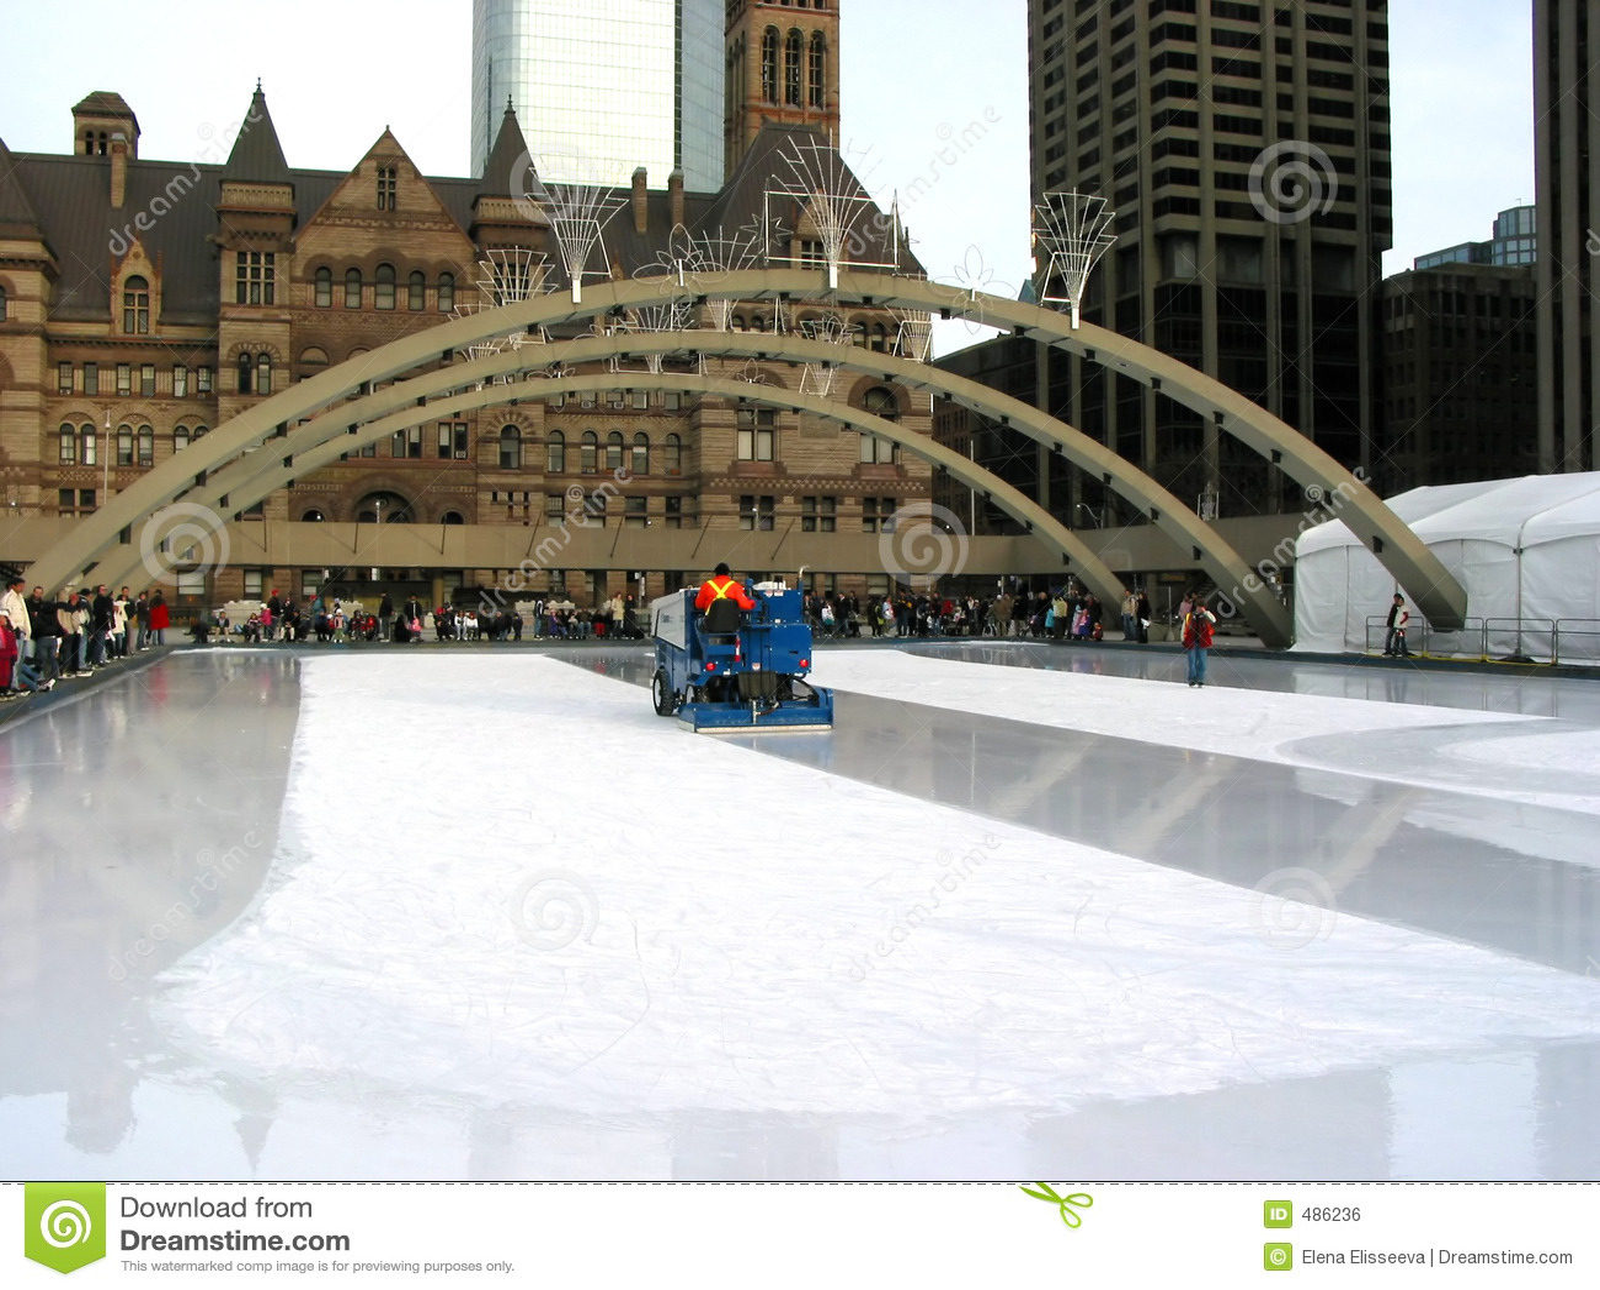 Zamboni En Pista De Patinaje En Toronto Foto de archivo - Imagen de ...